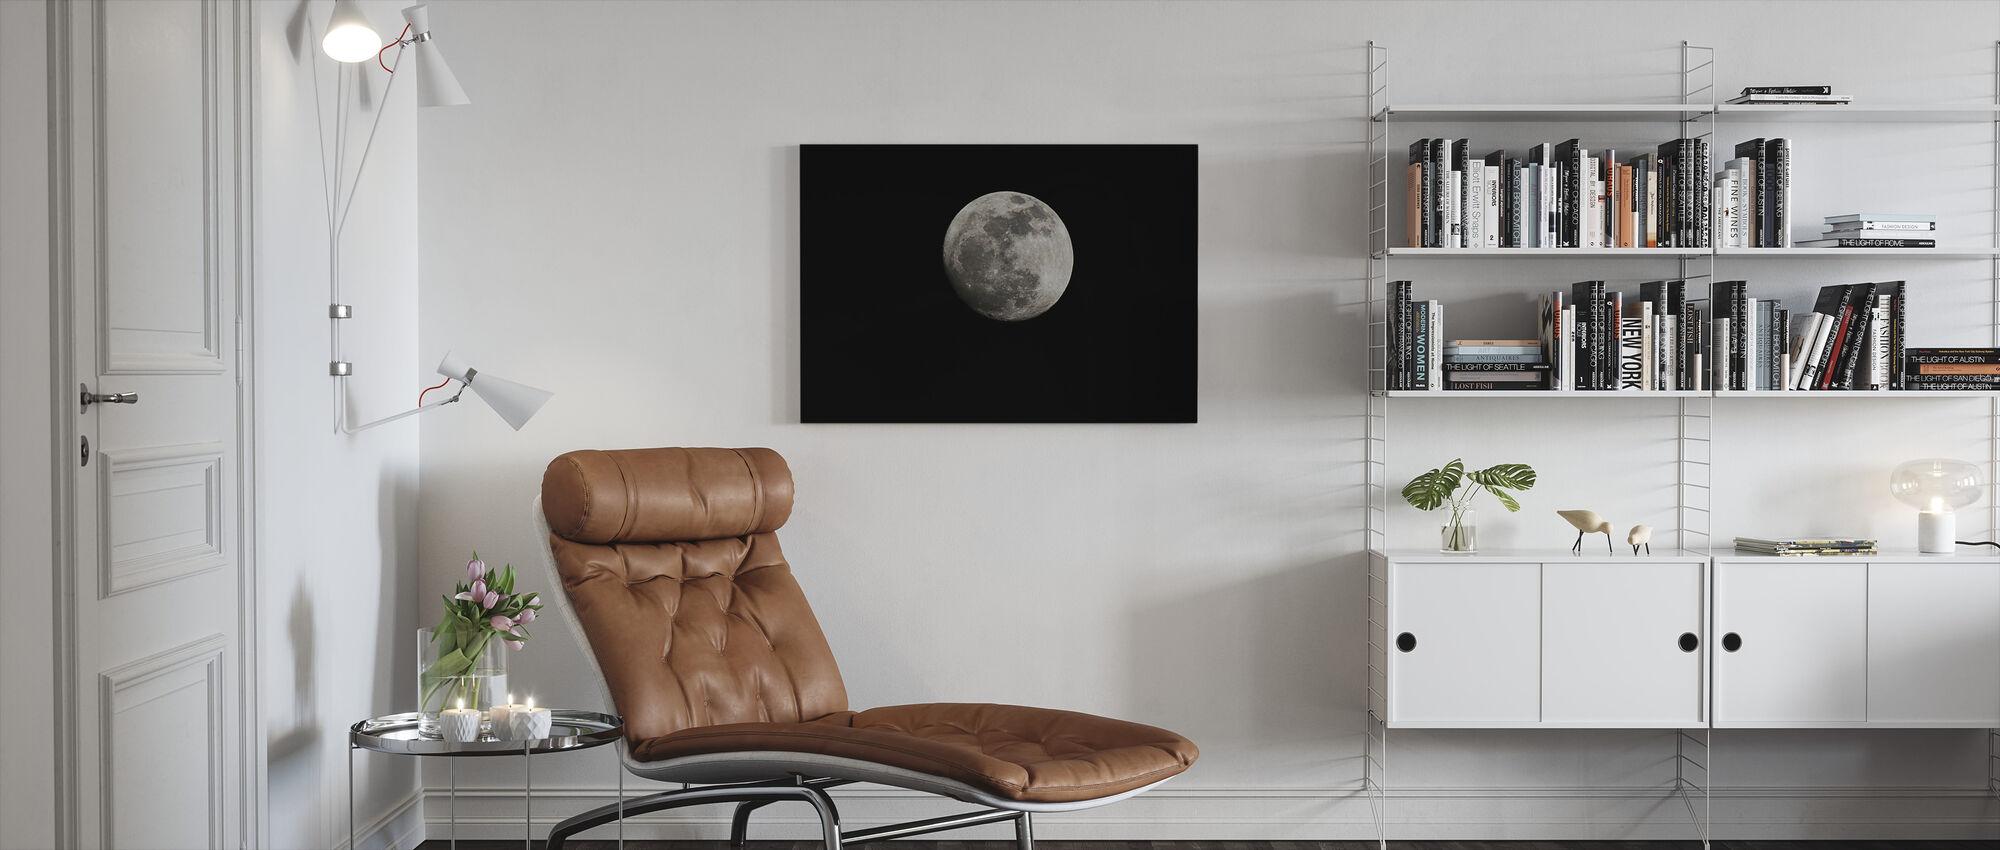 Månen - Canvastavla - Vardagsrum